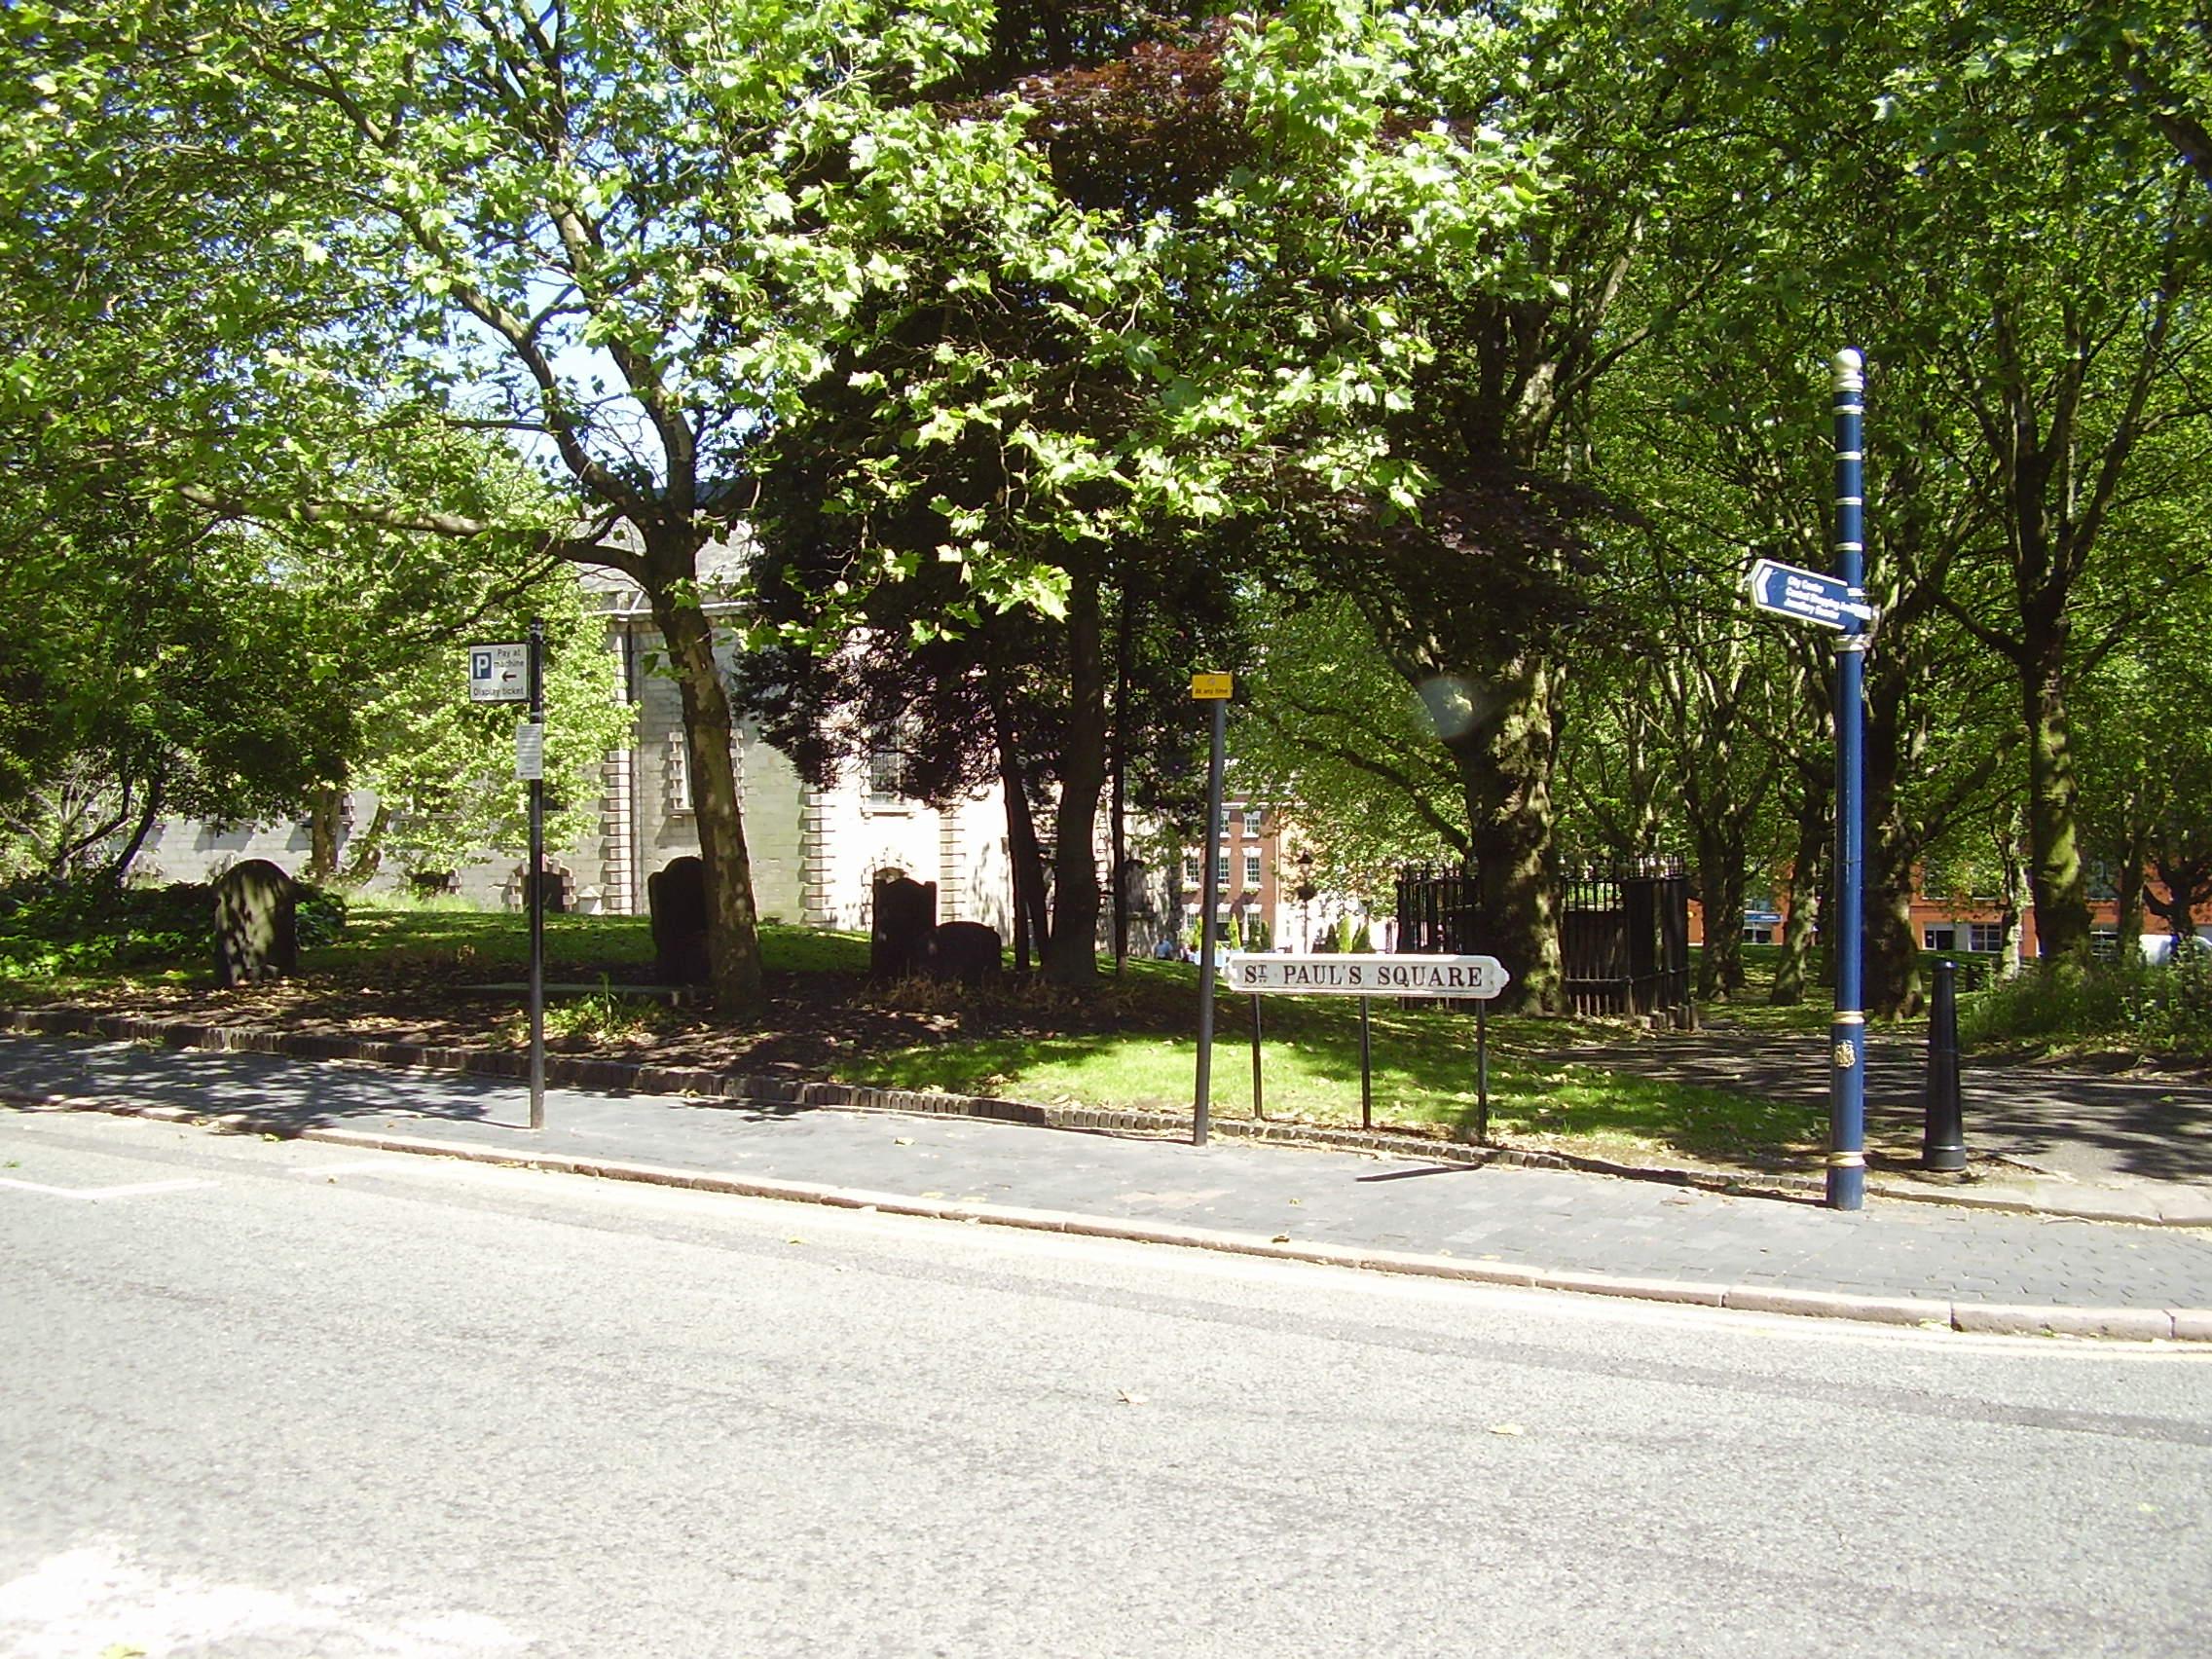 St Paul's Church Built in 1779  Grade 1 listed Birmingham Jewellery Quarter Photographed 2008